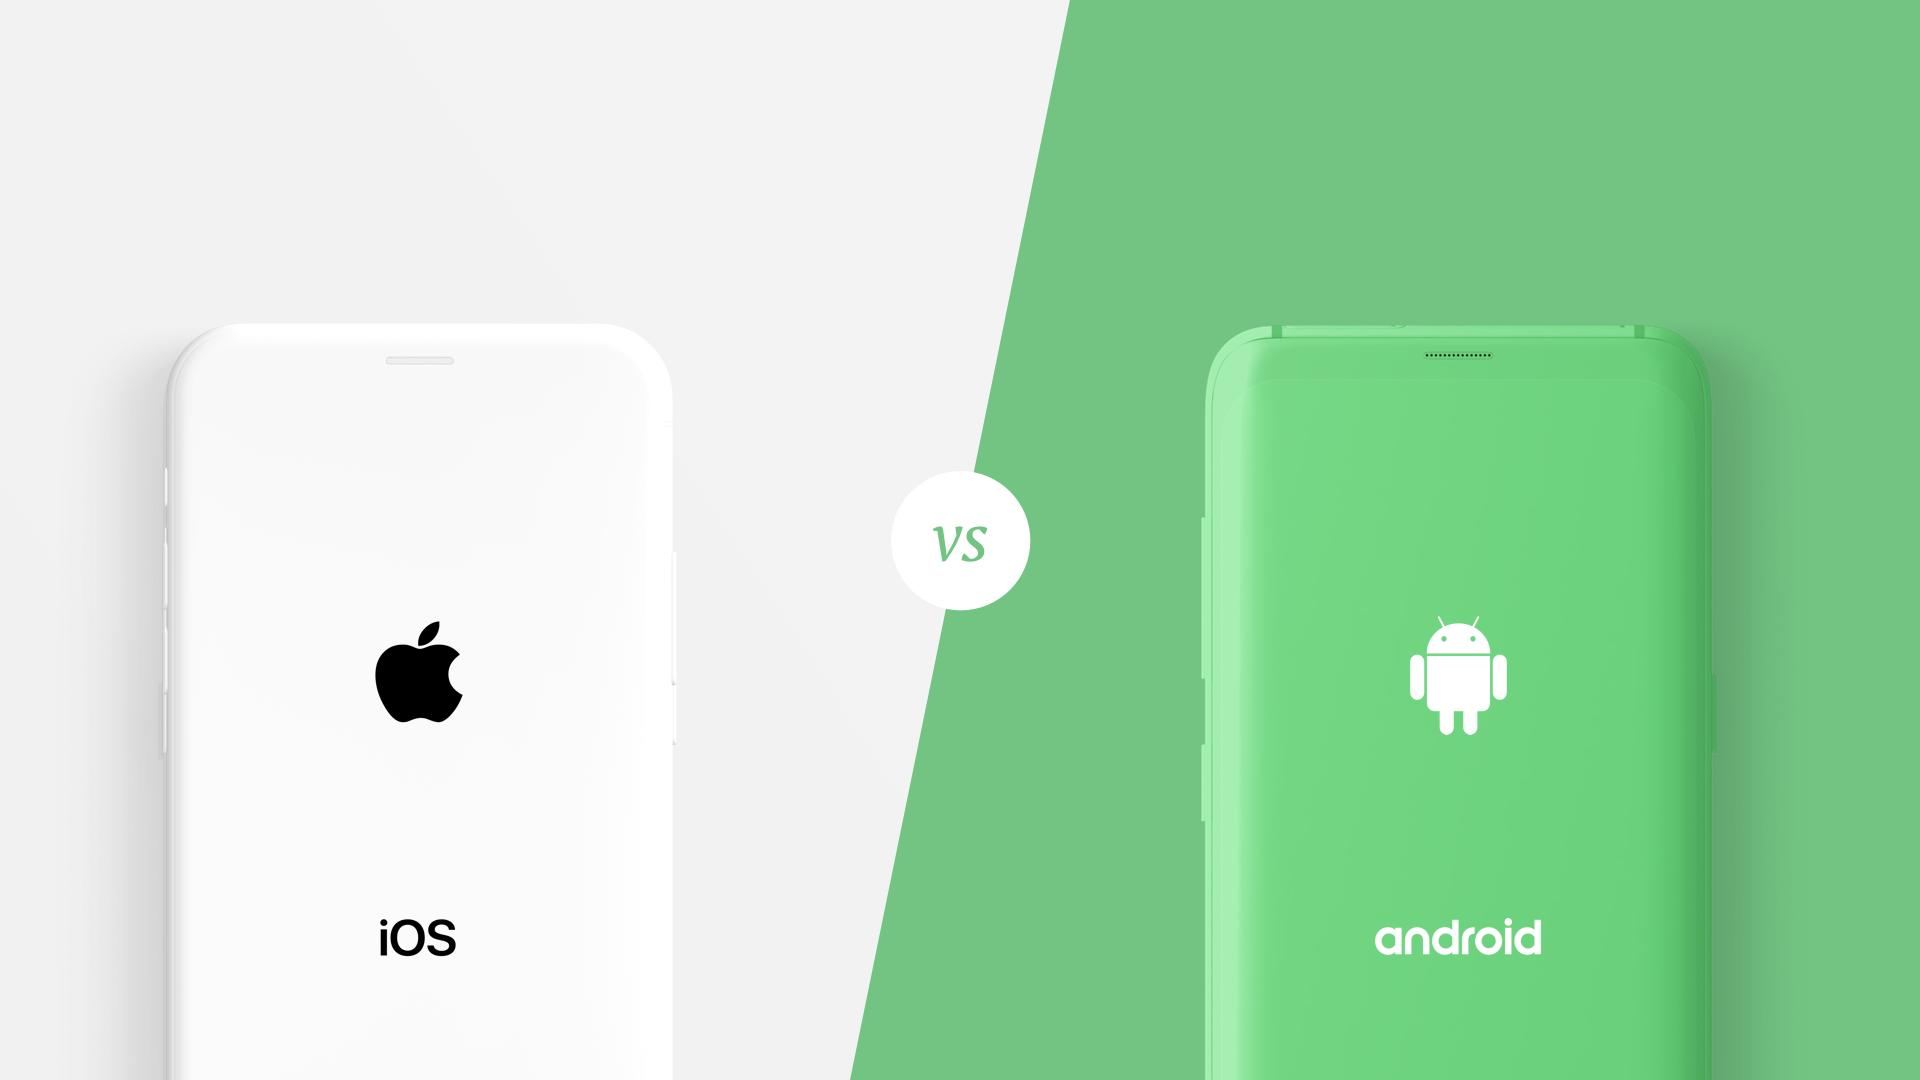 Apple iOS & Google Android phones